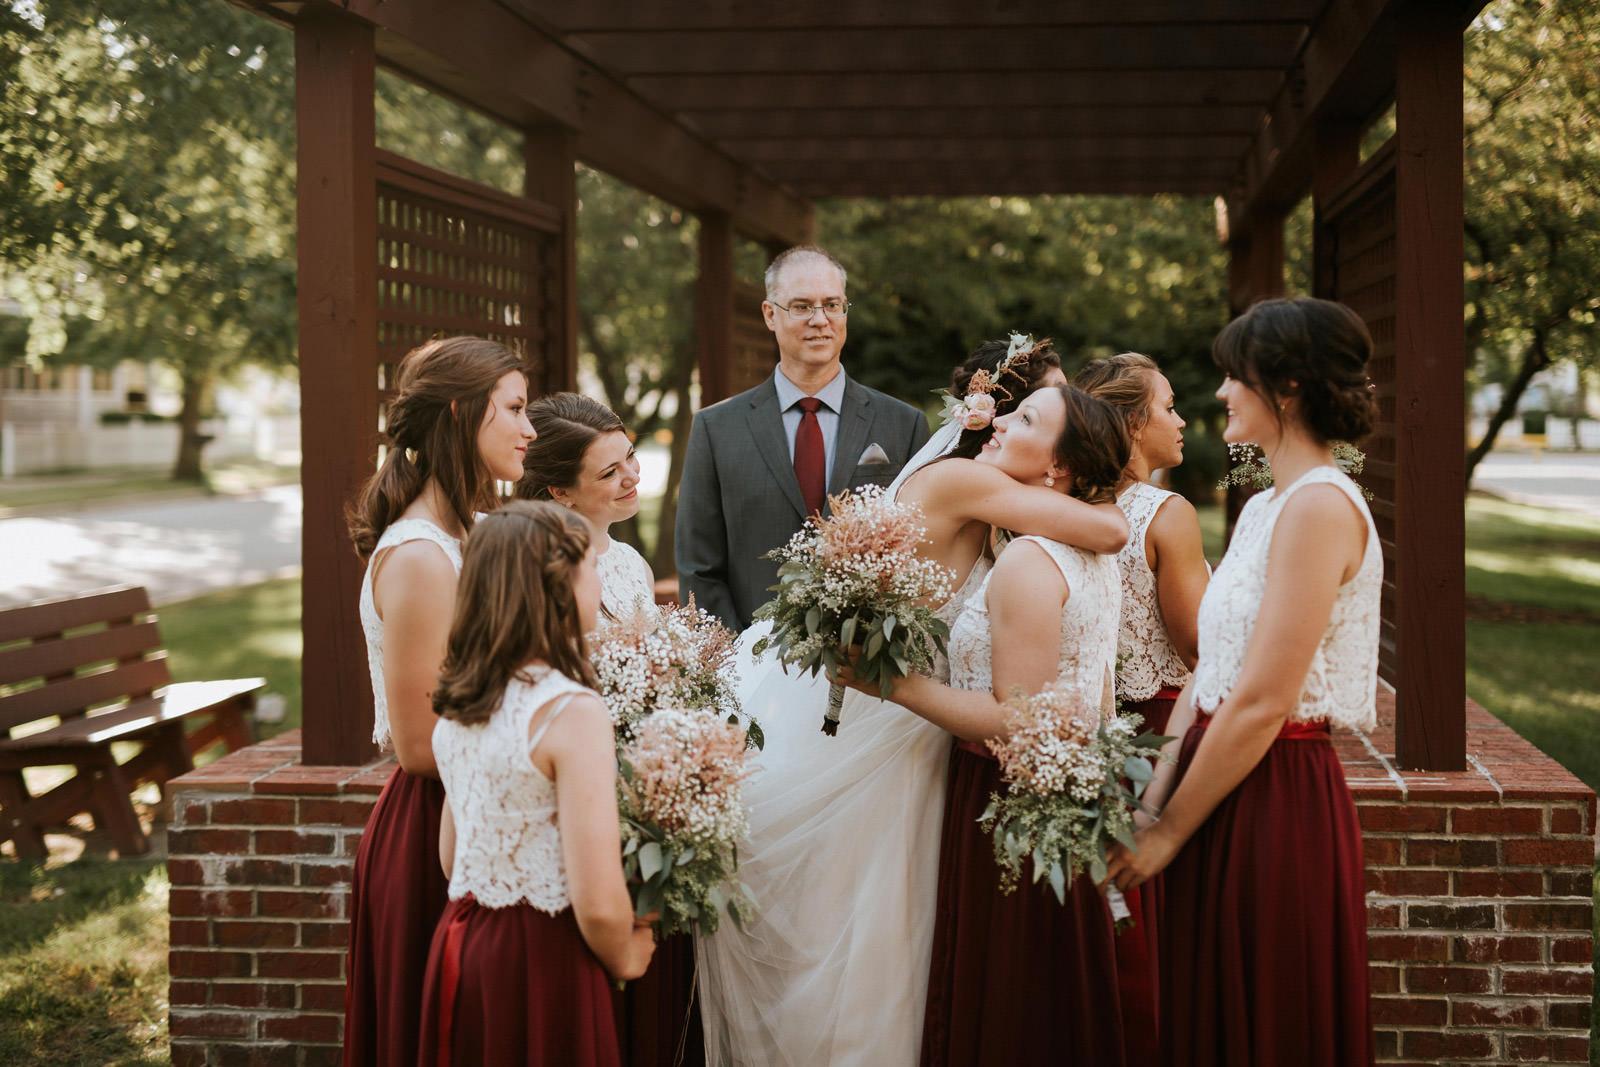 Outdoor California wedding ceremony photography